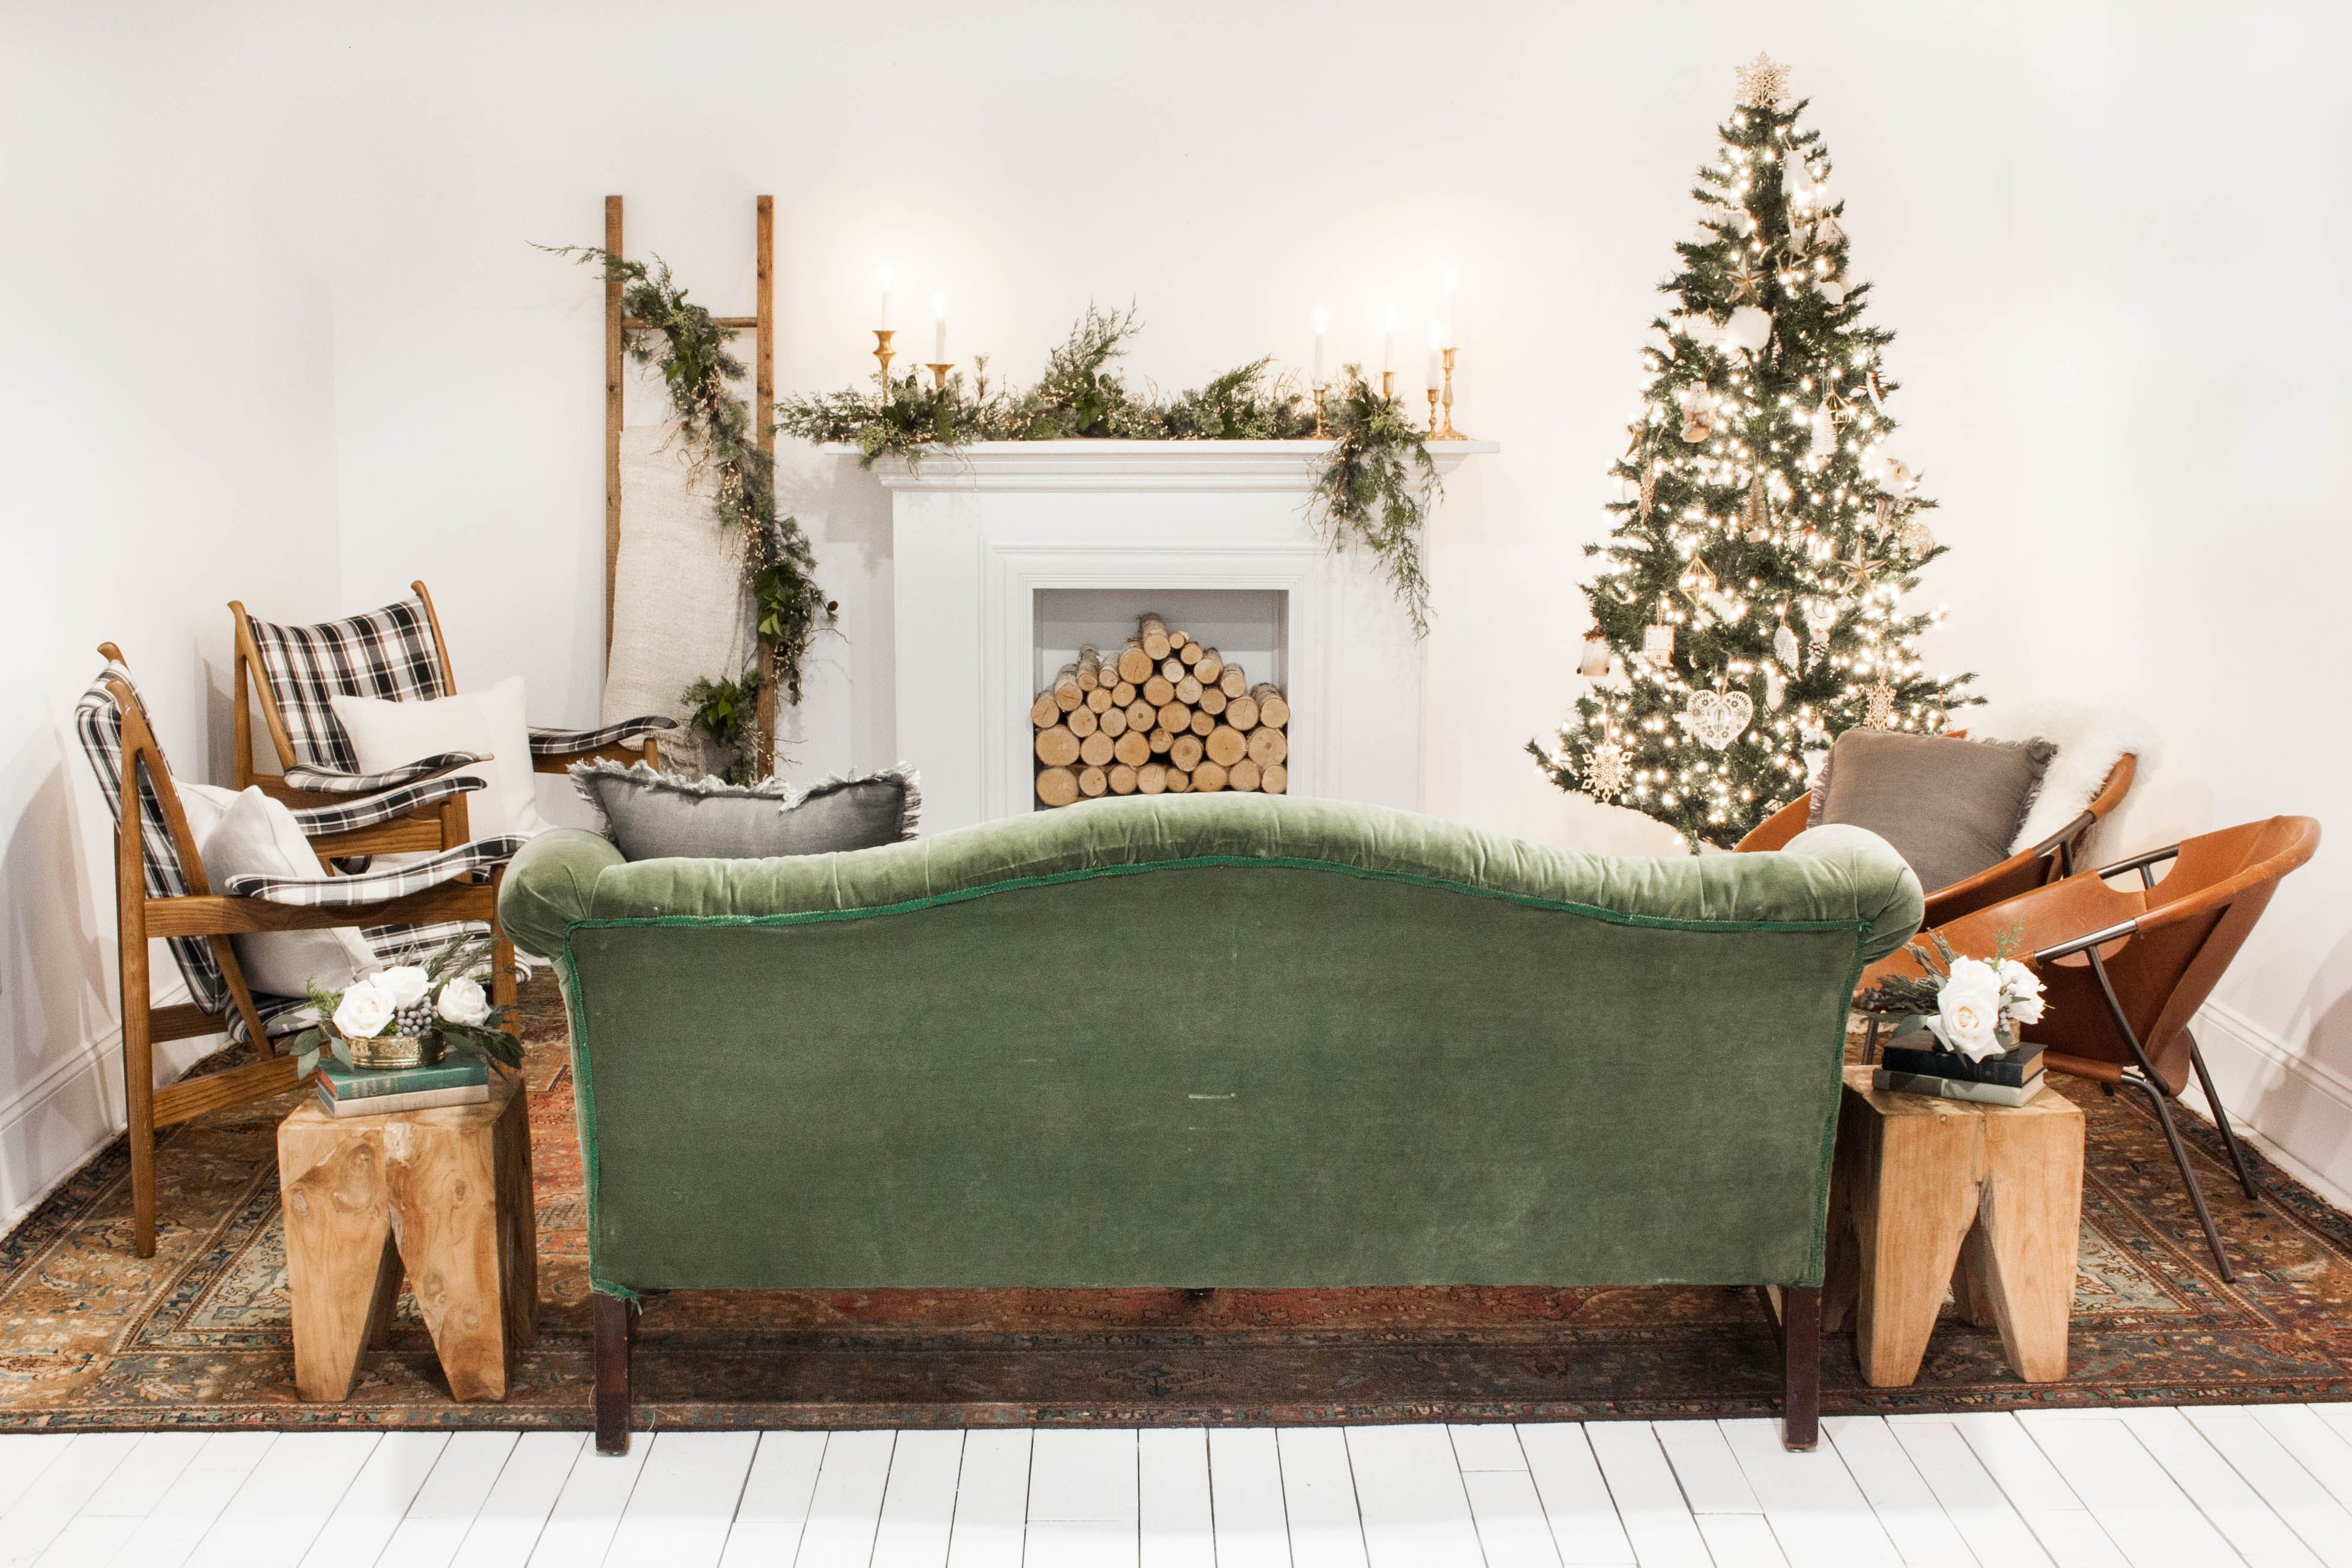 Winter Holiday Scandinavian Inspired Corporate Party Austin Tx Via Birch Brass Vin Danish Modern Furniture Mid Century Modern Furniture Modern Furnishings